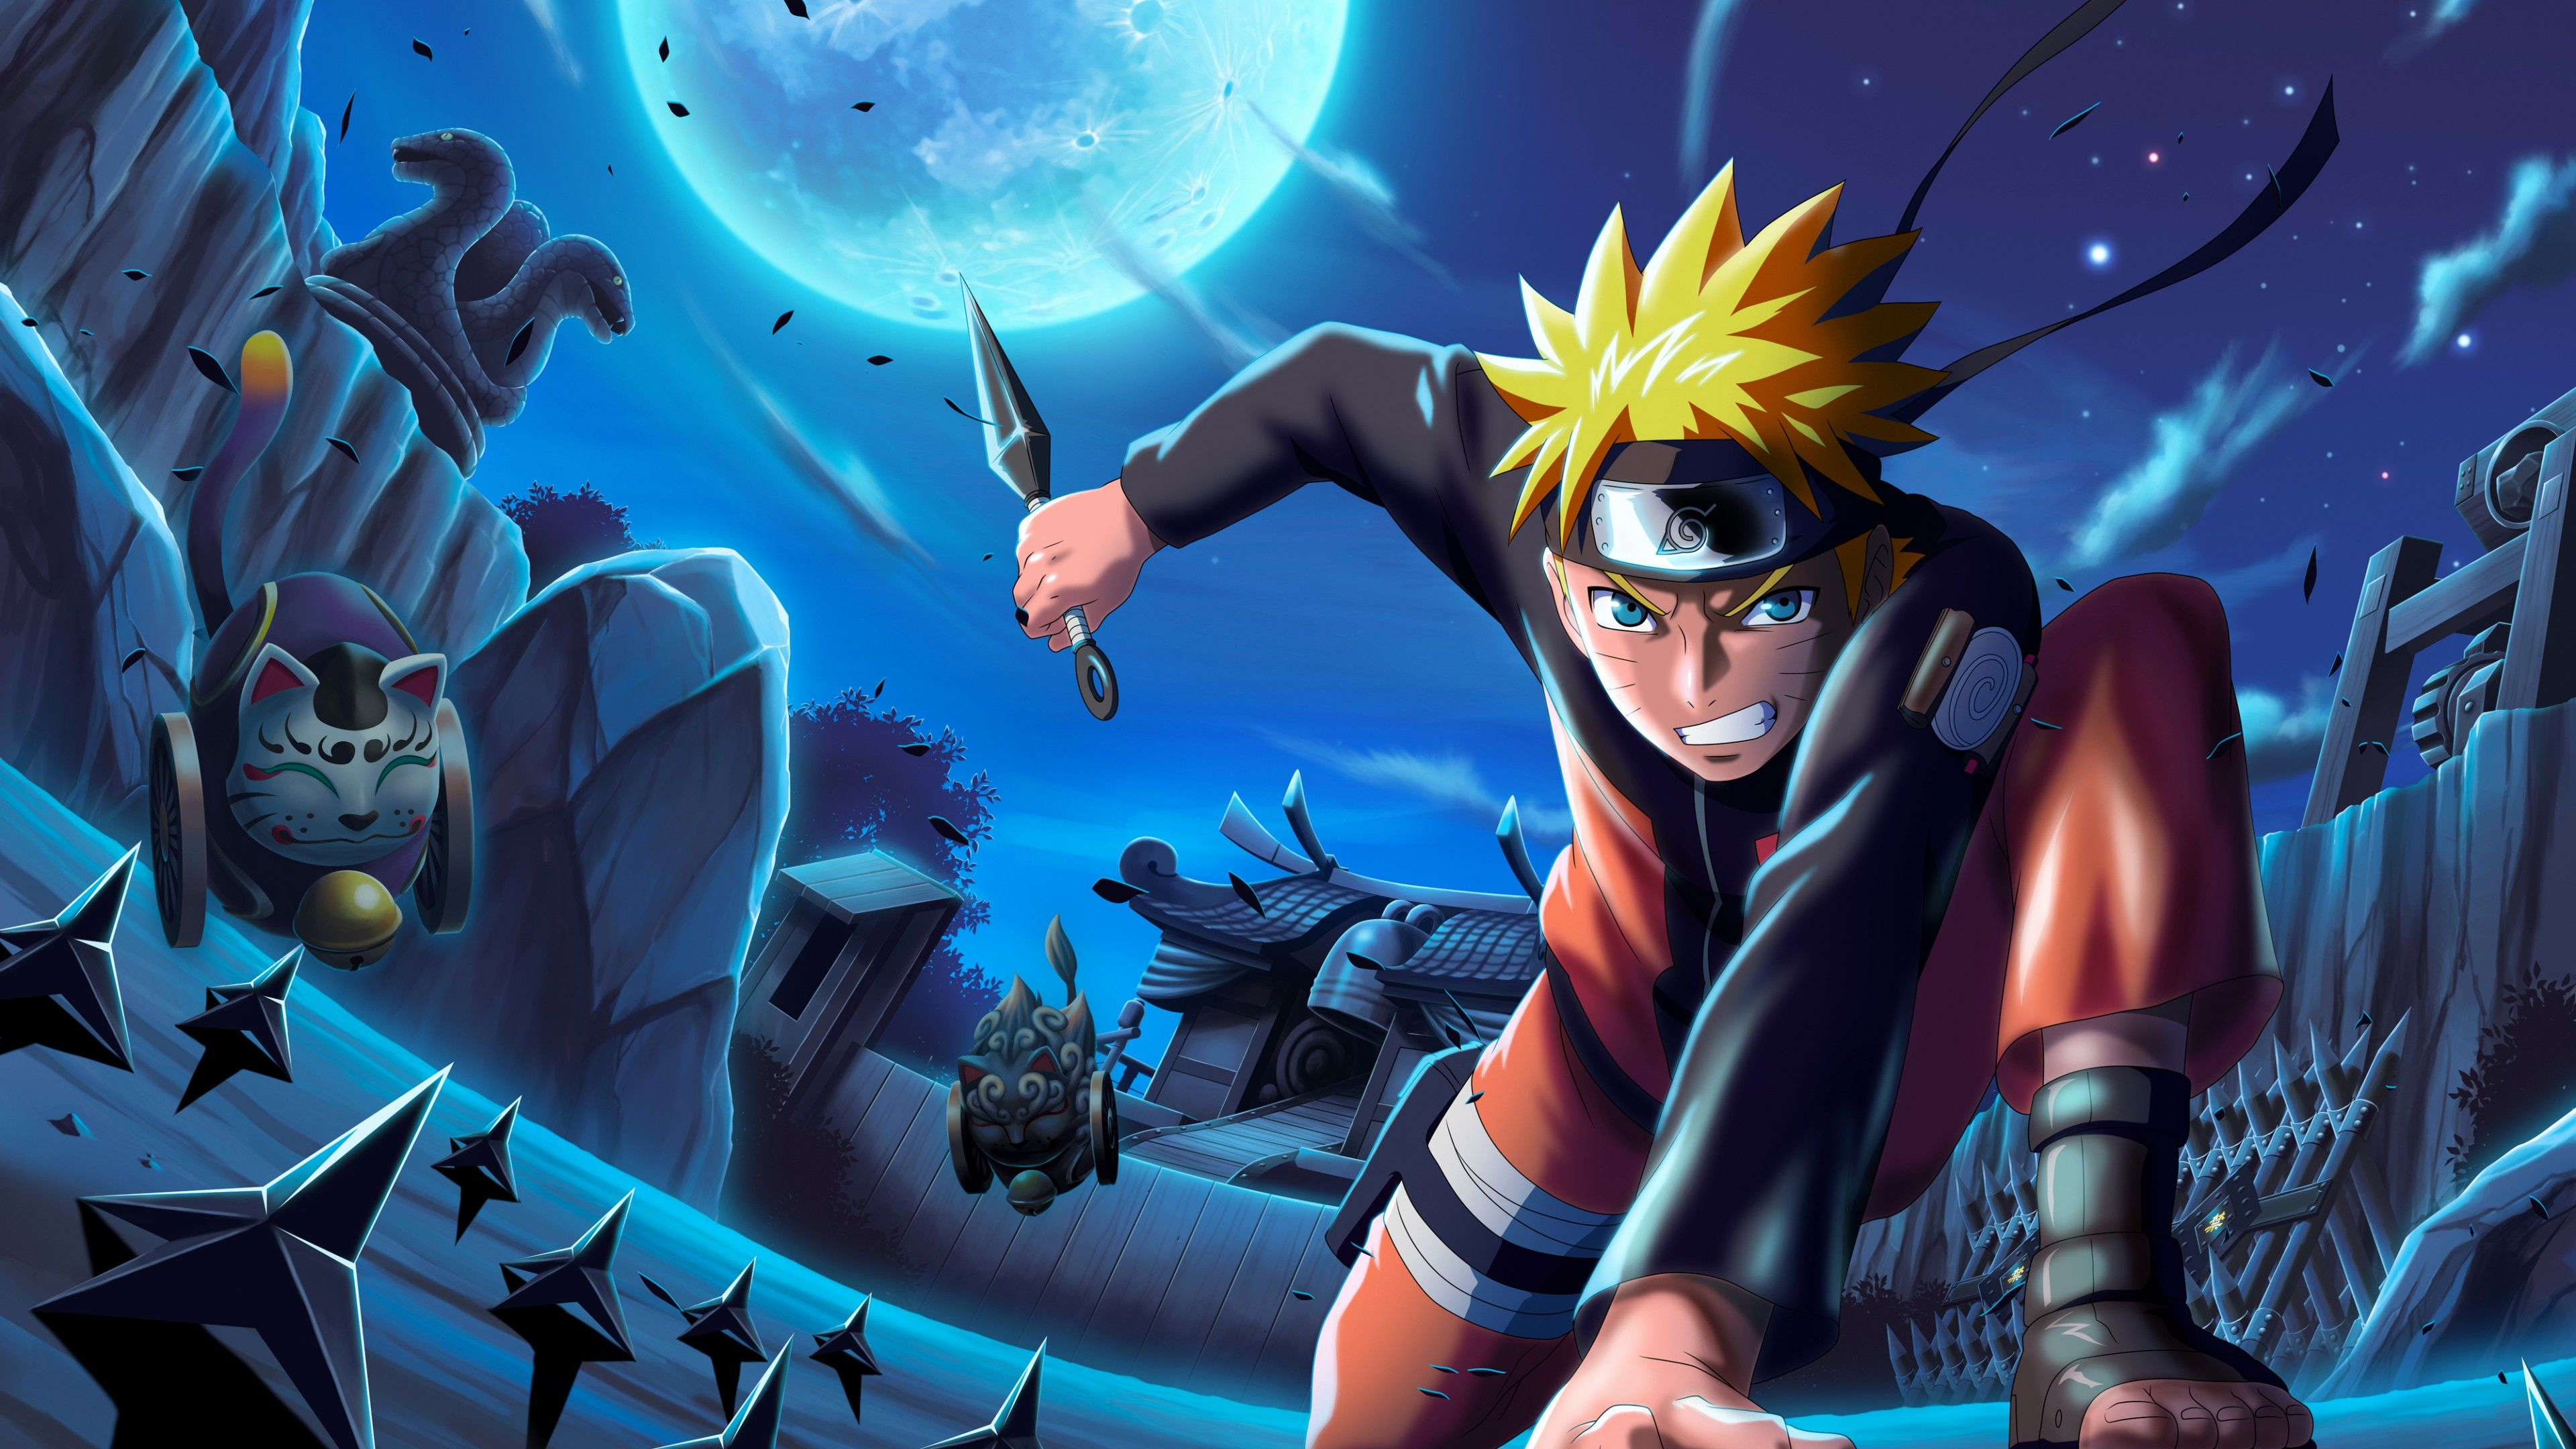 Naruto Uzumaki Wallpaper In 2020 Hd Anime Wallpapers Cool Anime Wallpapers Naruto Movies In Order